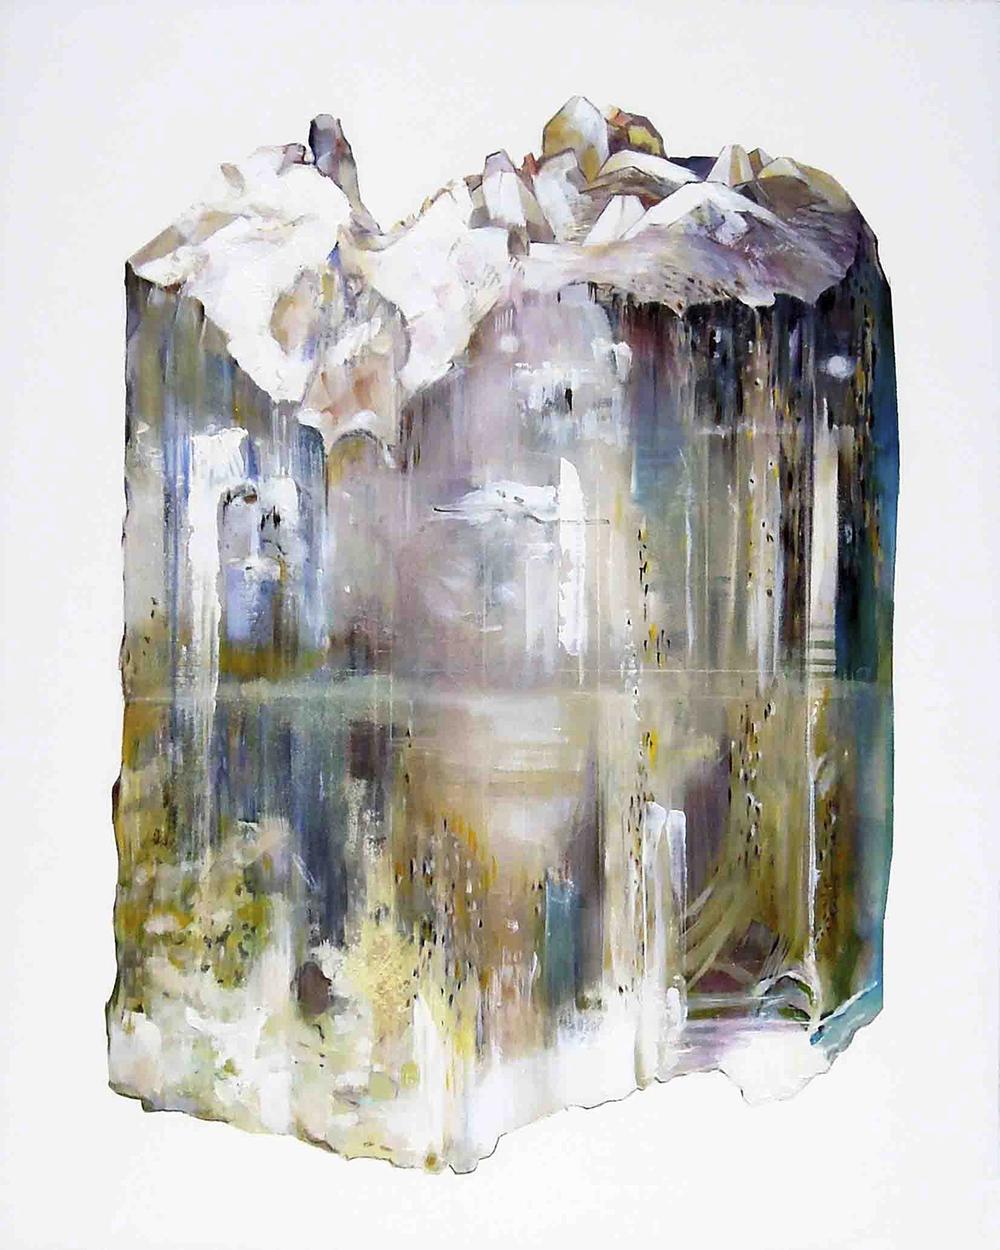 Topaz oil on panel 20x16, 2012